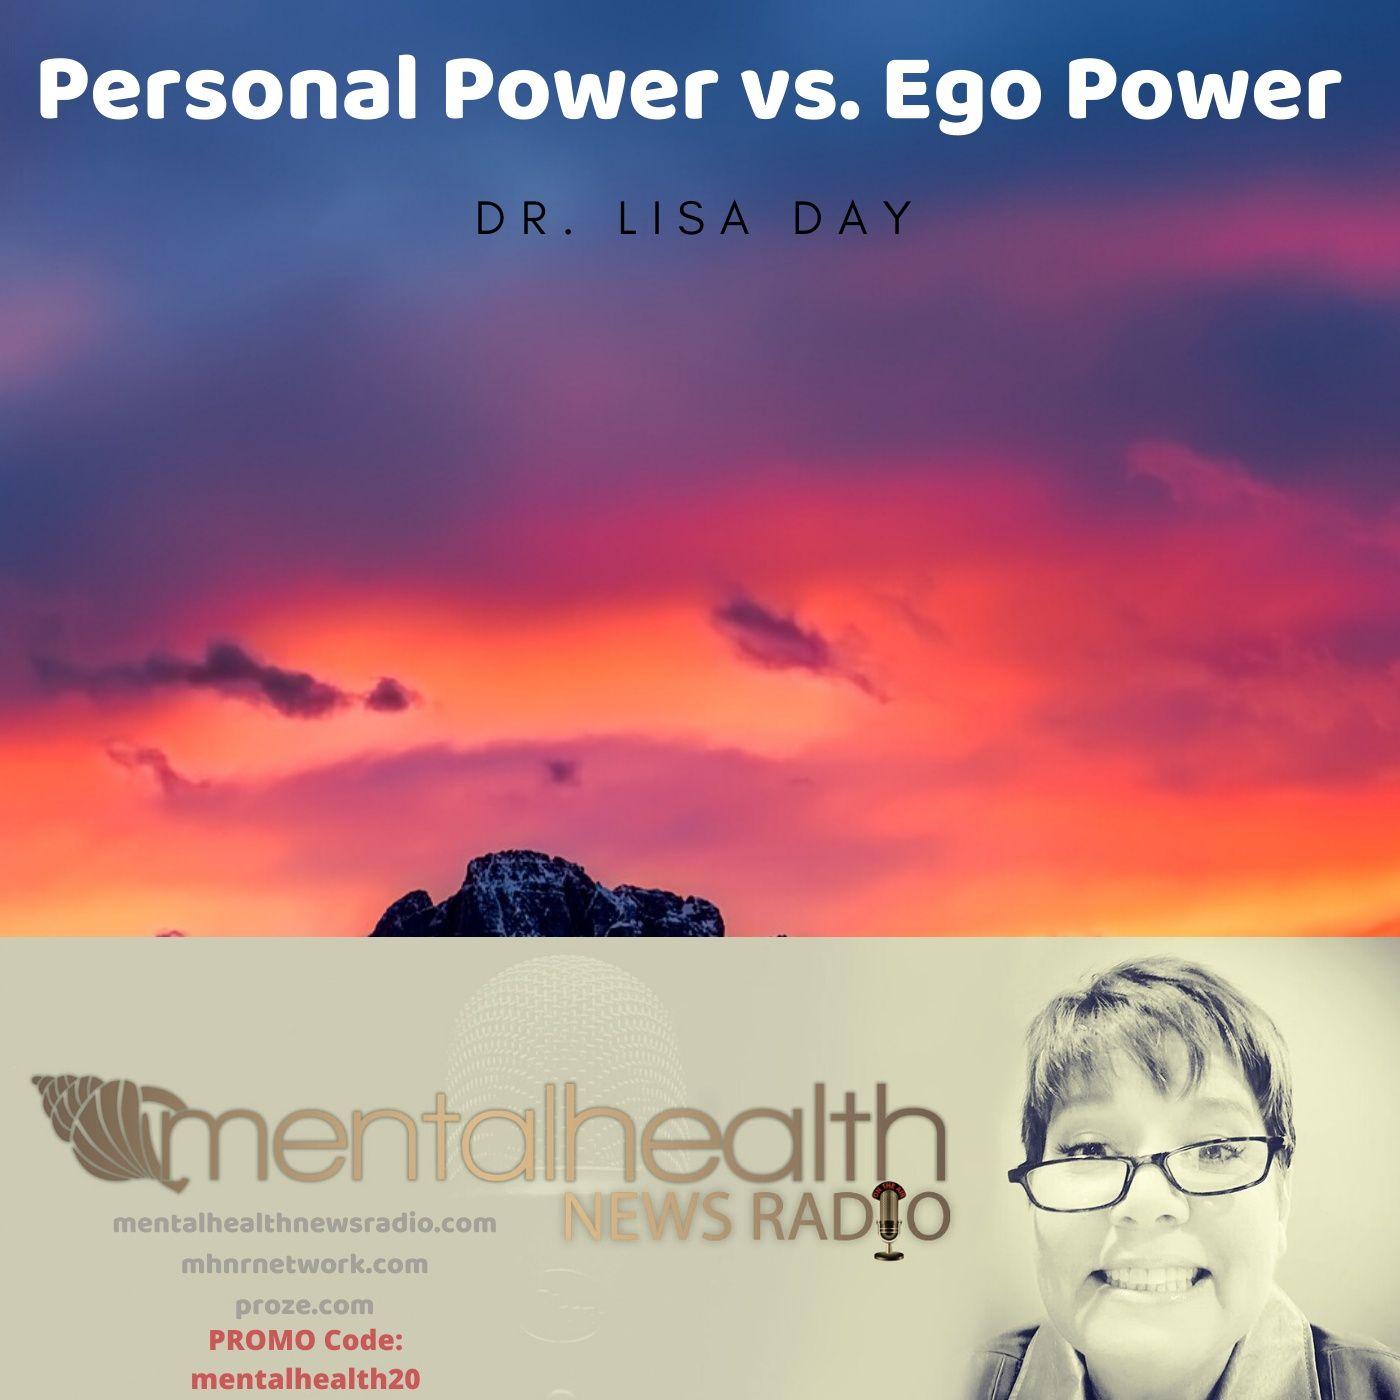 Mental Health News Radio - Personal Power vs. Ego Power